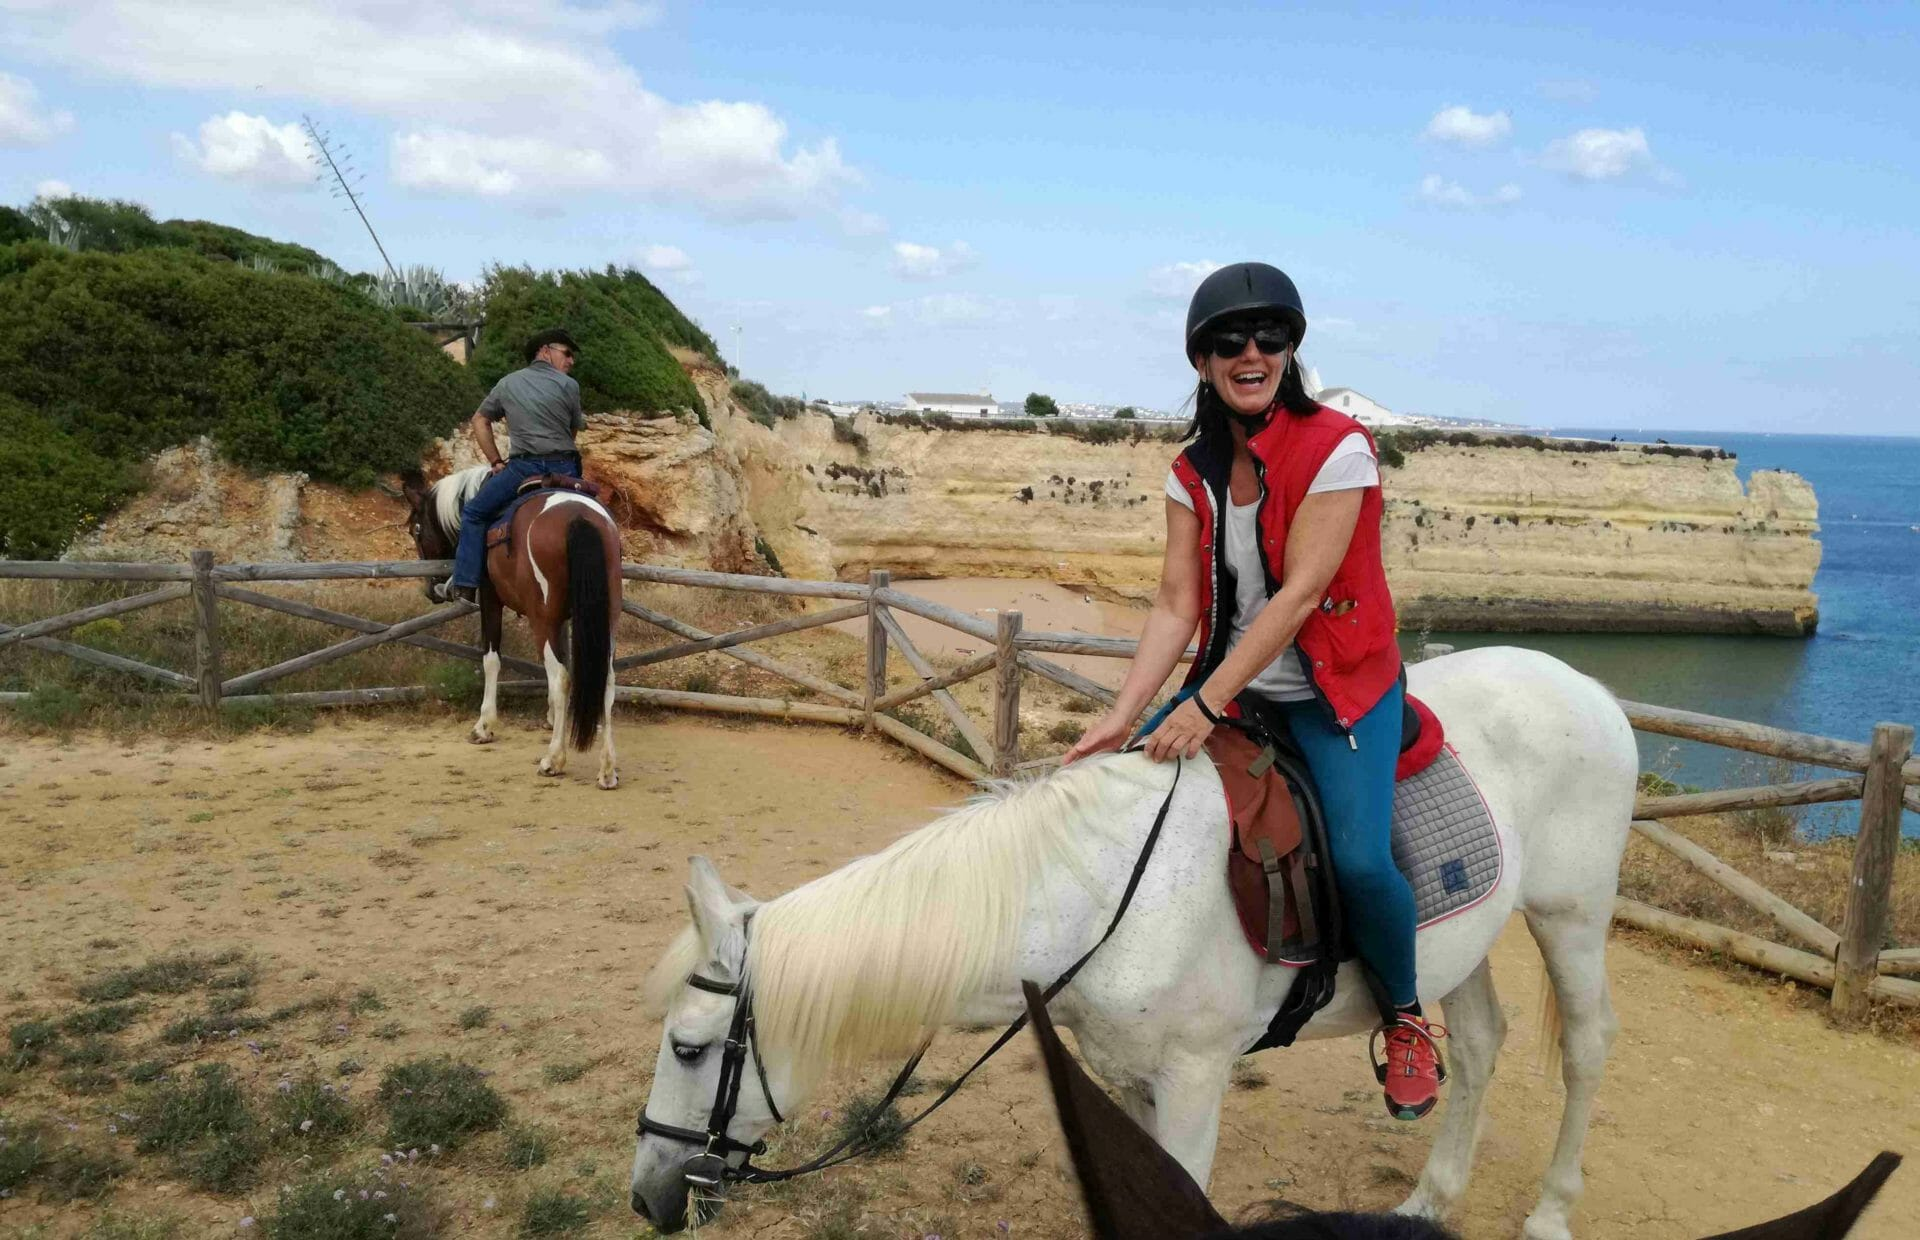 On horseback along the cliffs